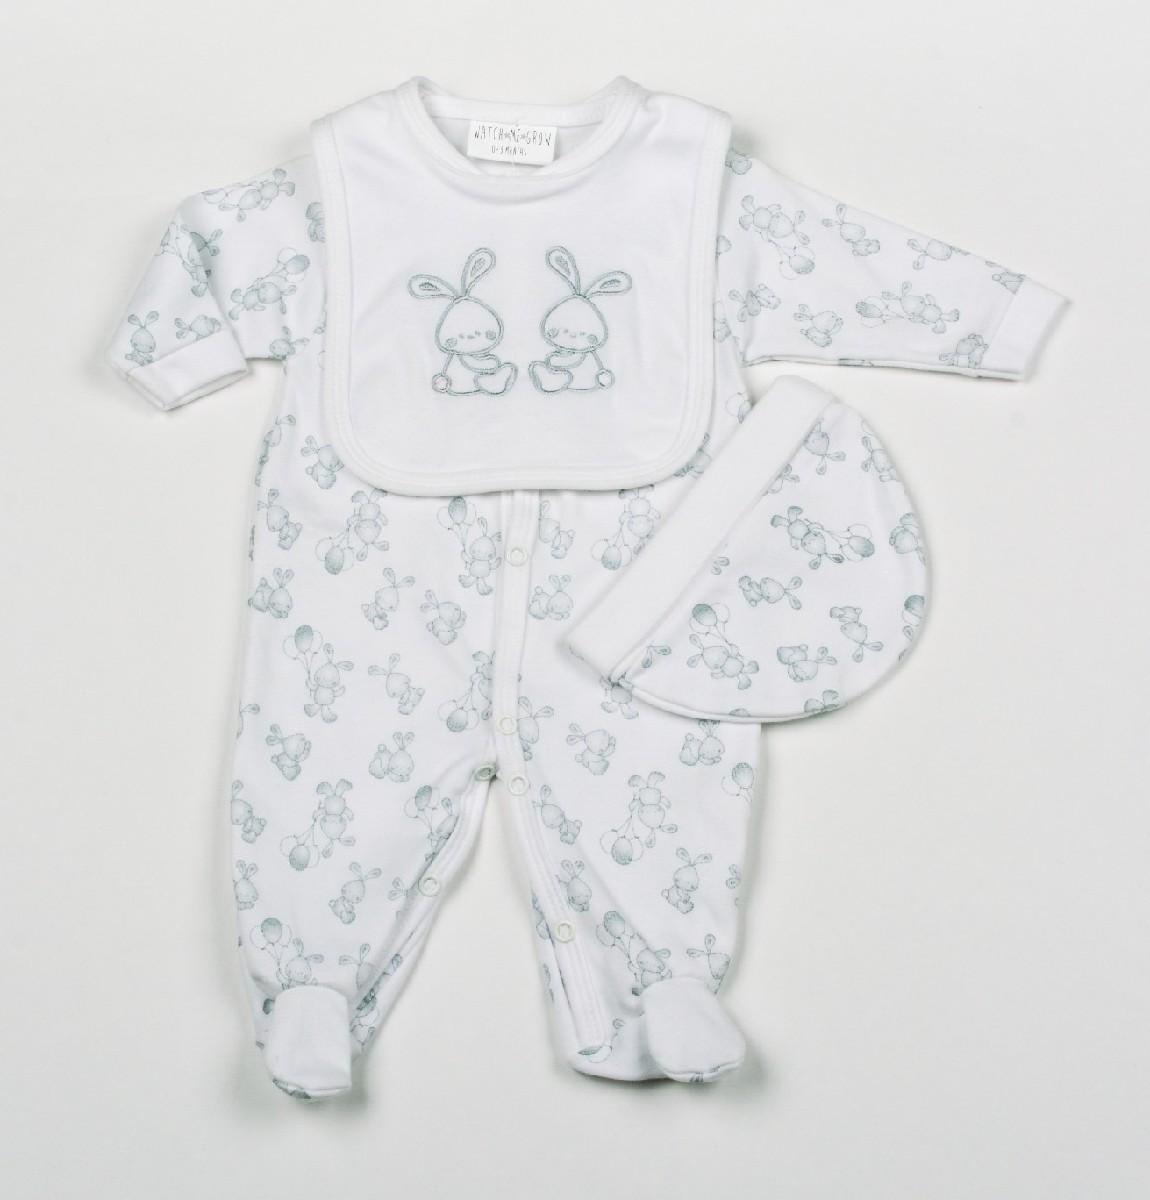 Baby 3pc Layette Gift Set - Sleepsuit, Bib And Cap